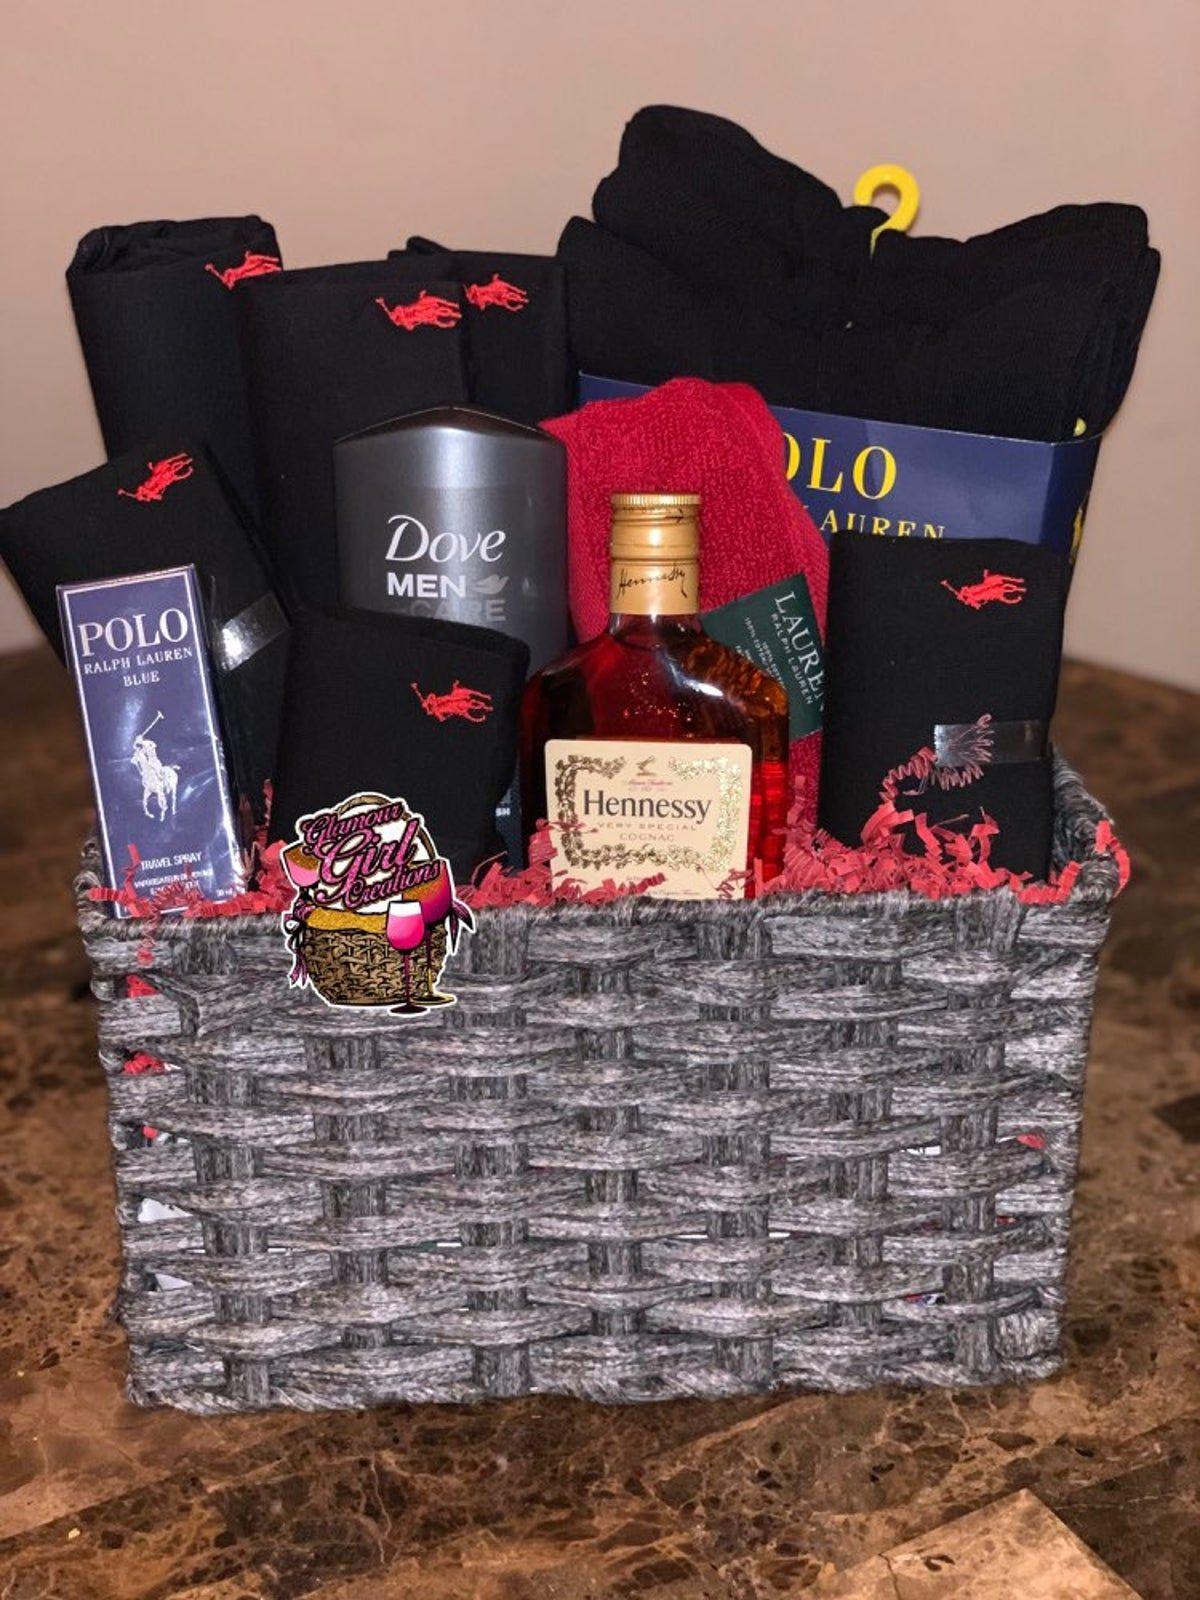 polo giftbasket for him on Mercari